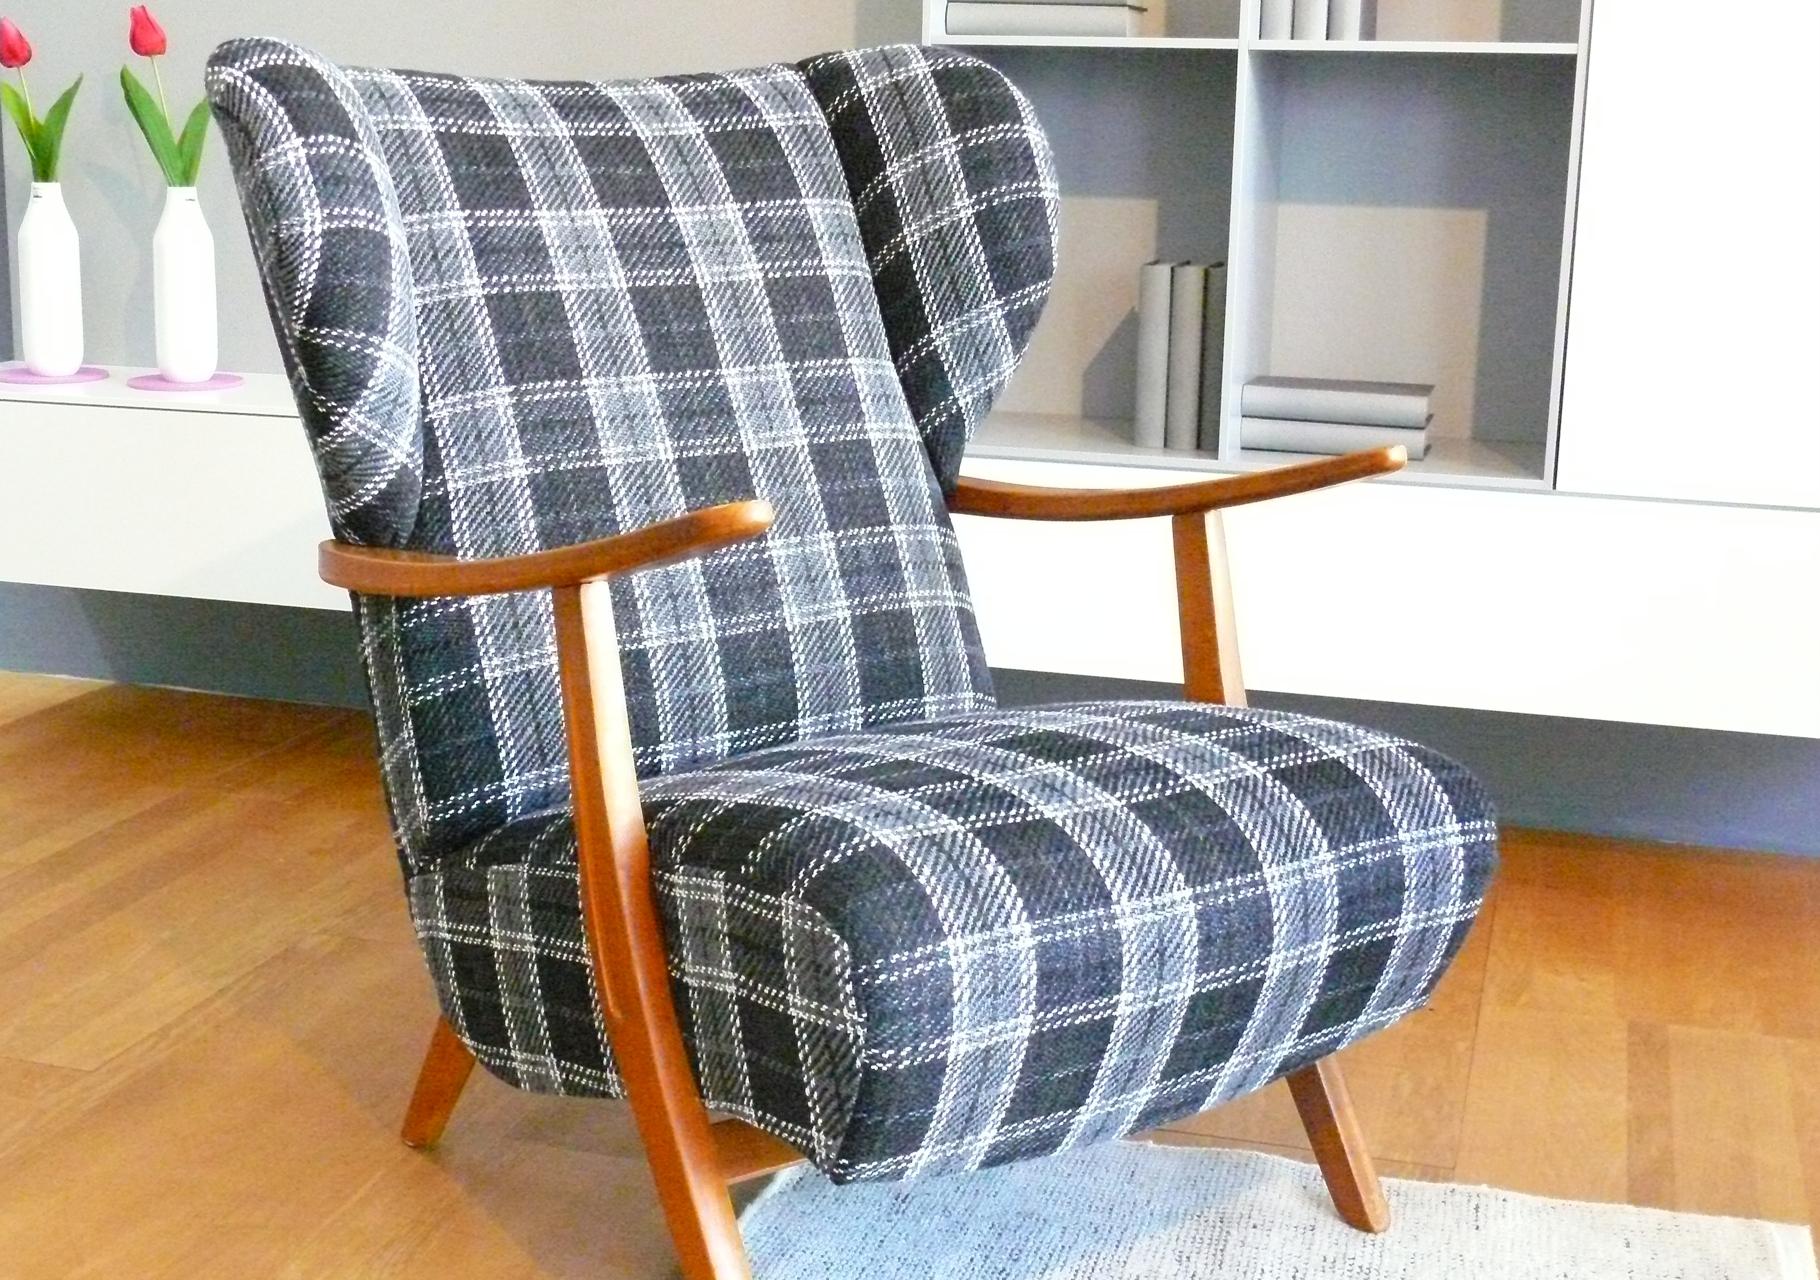 Oma´s Sessel mit neuem Pepp